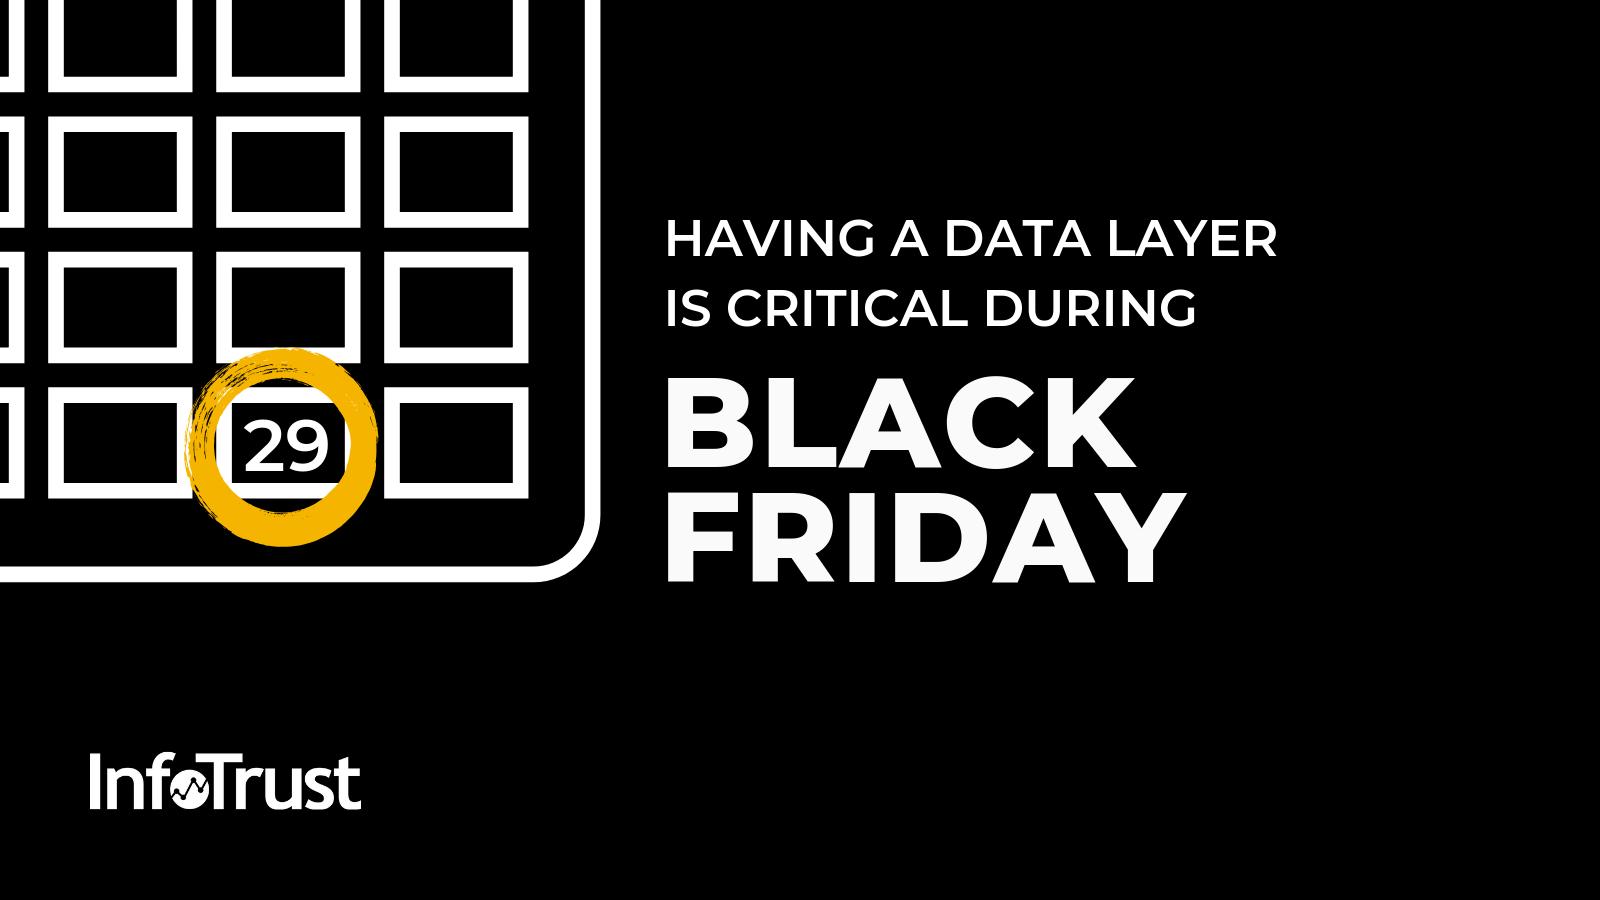 Black Friday data layer